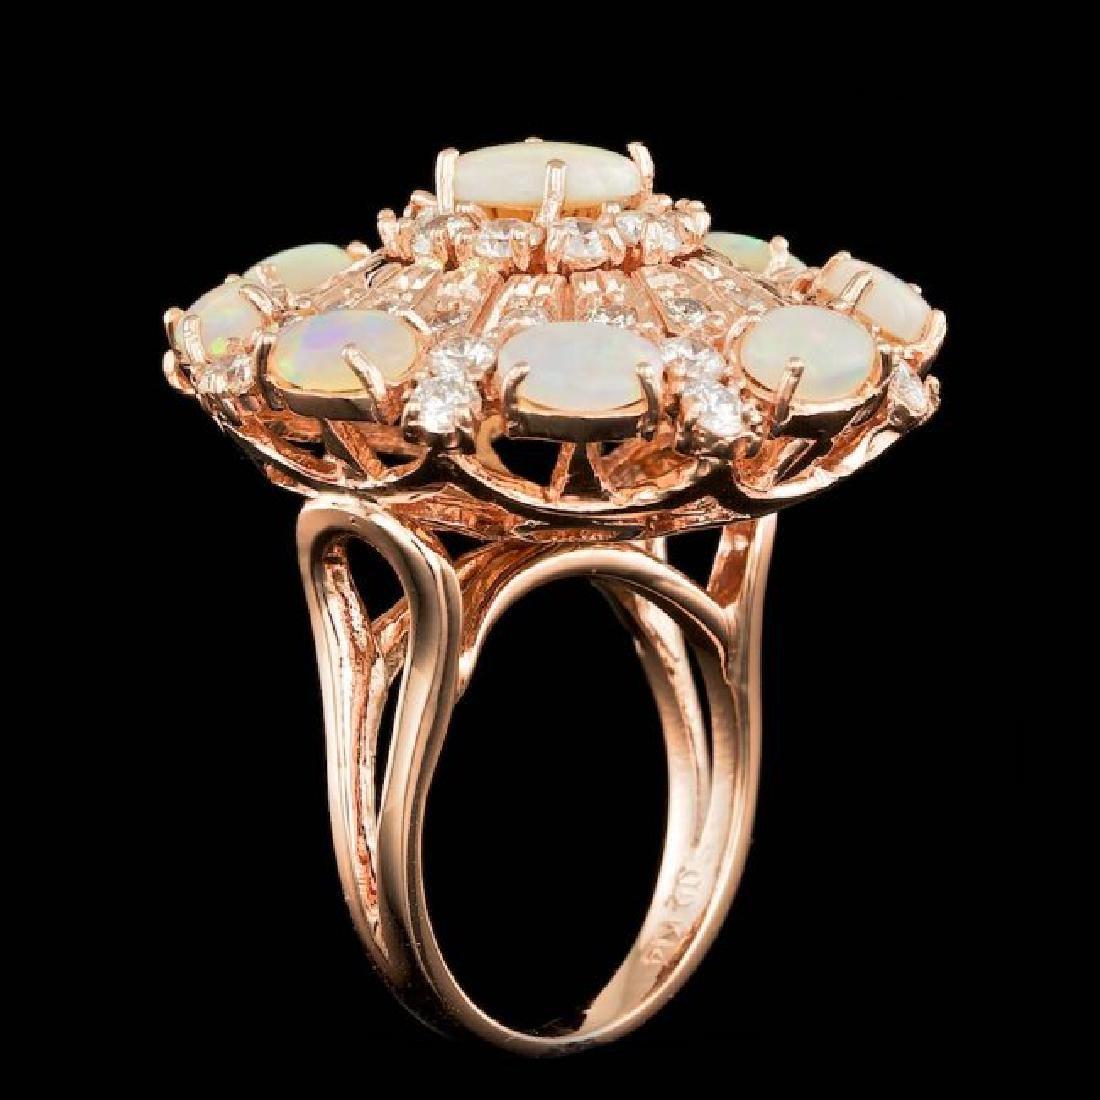 14k Rose Gold 3.00ct Opal 2.15ct Diamond Ring - 5